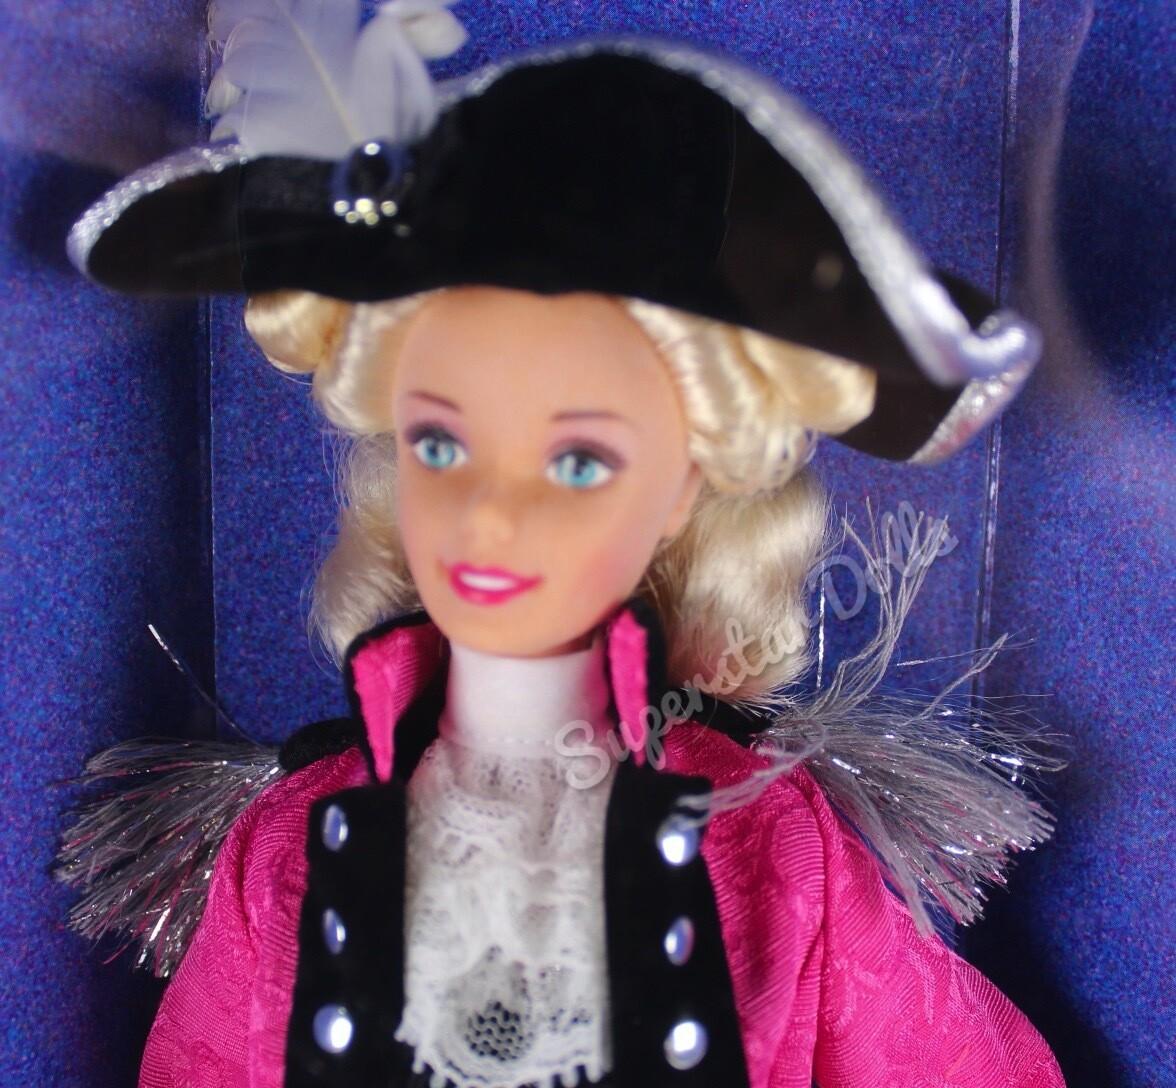 1996 Special Edition: George Washington Barbie Doll